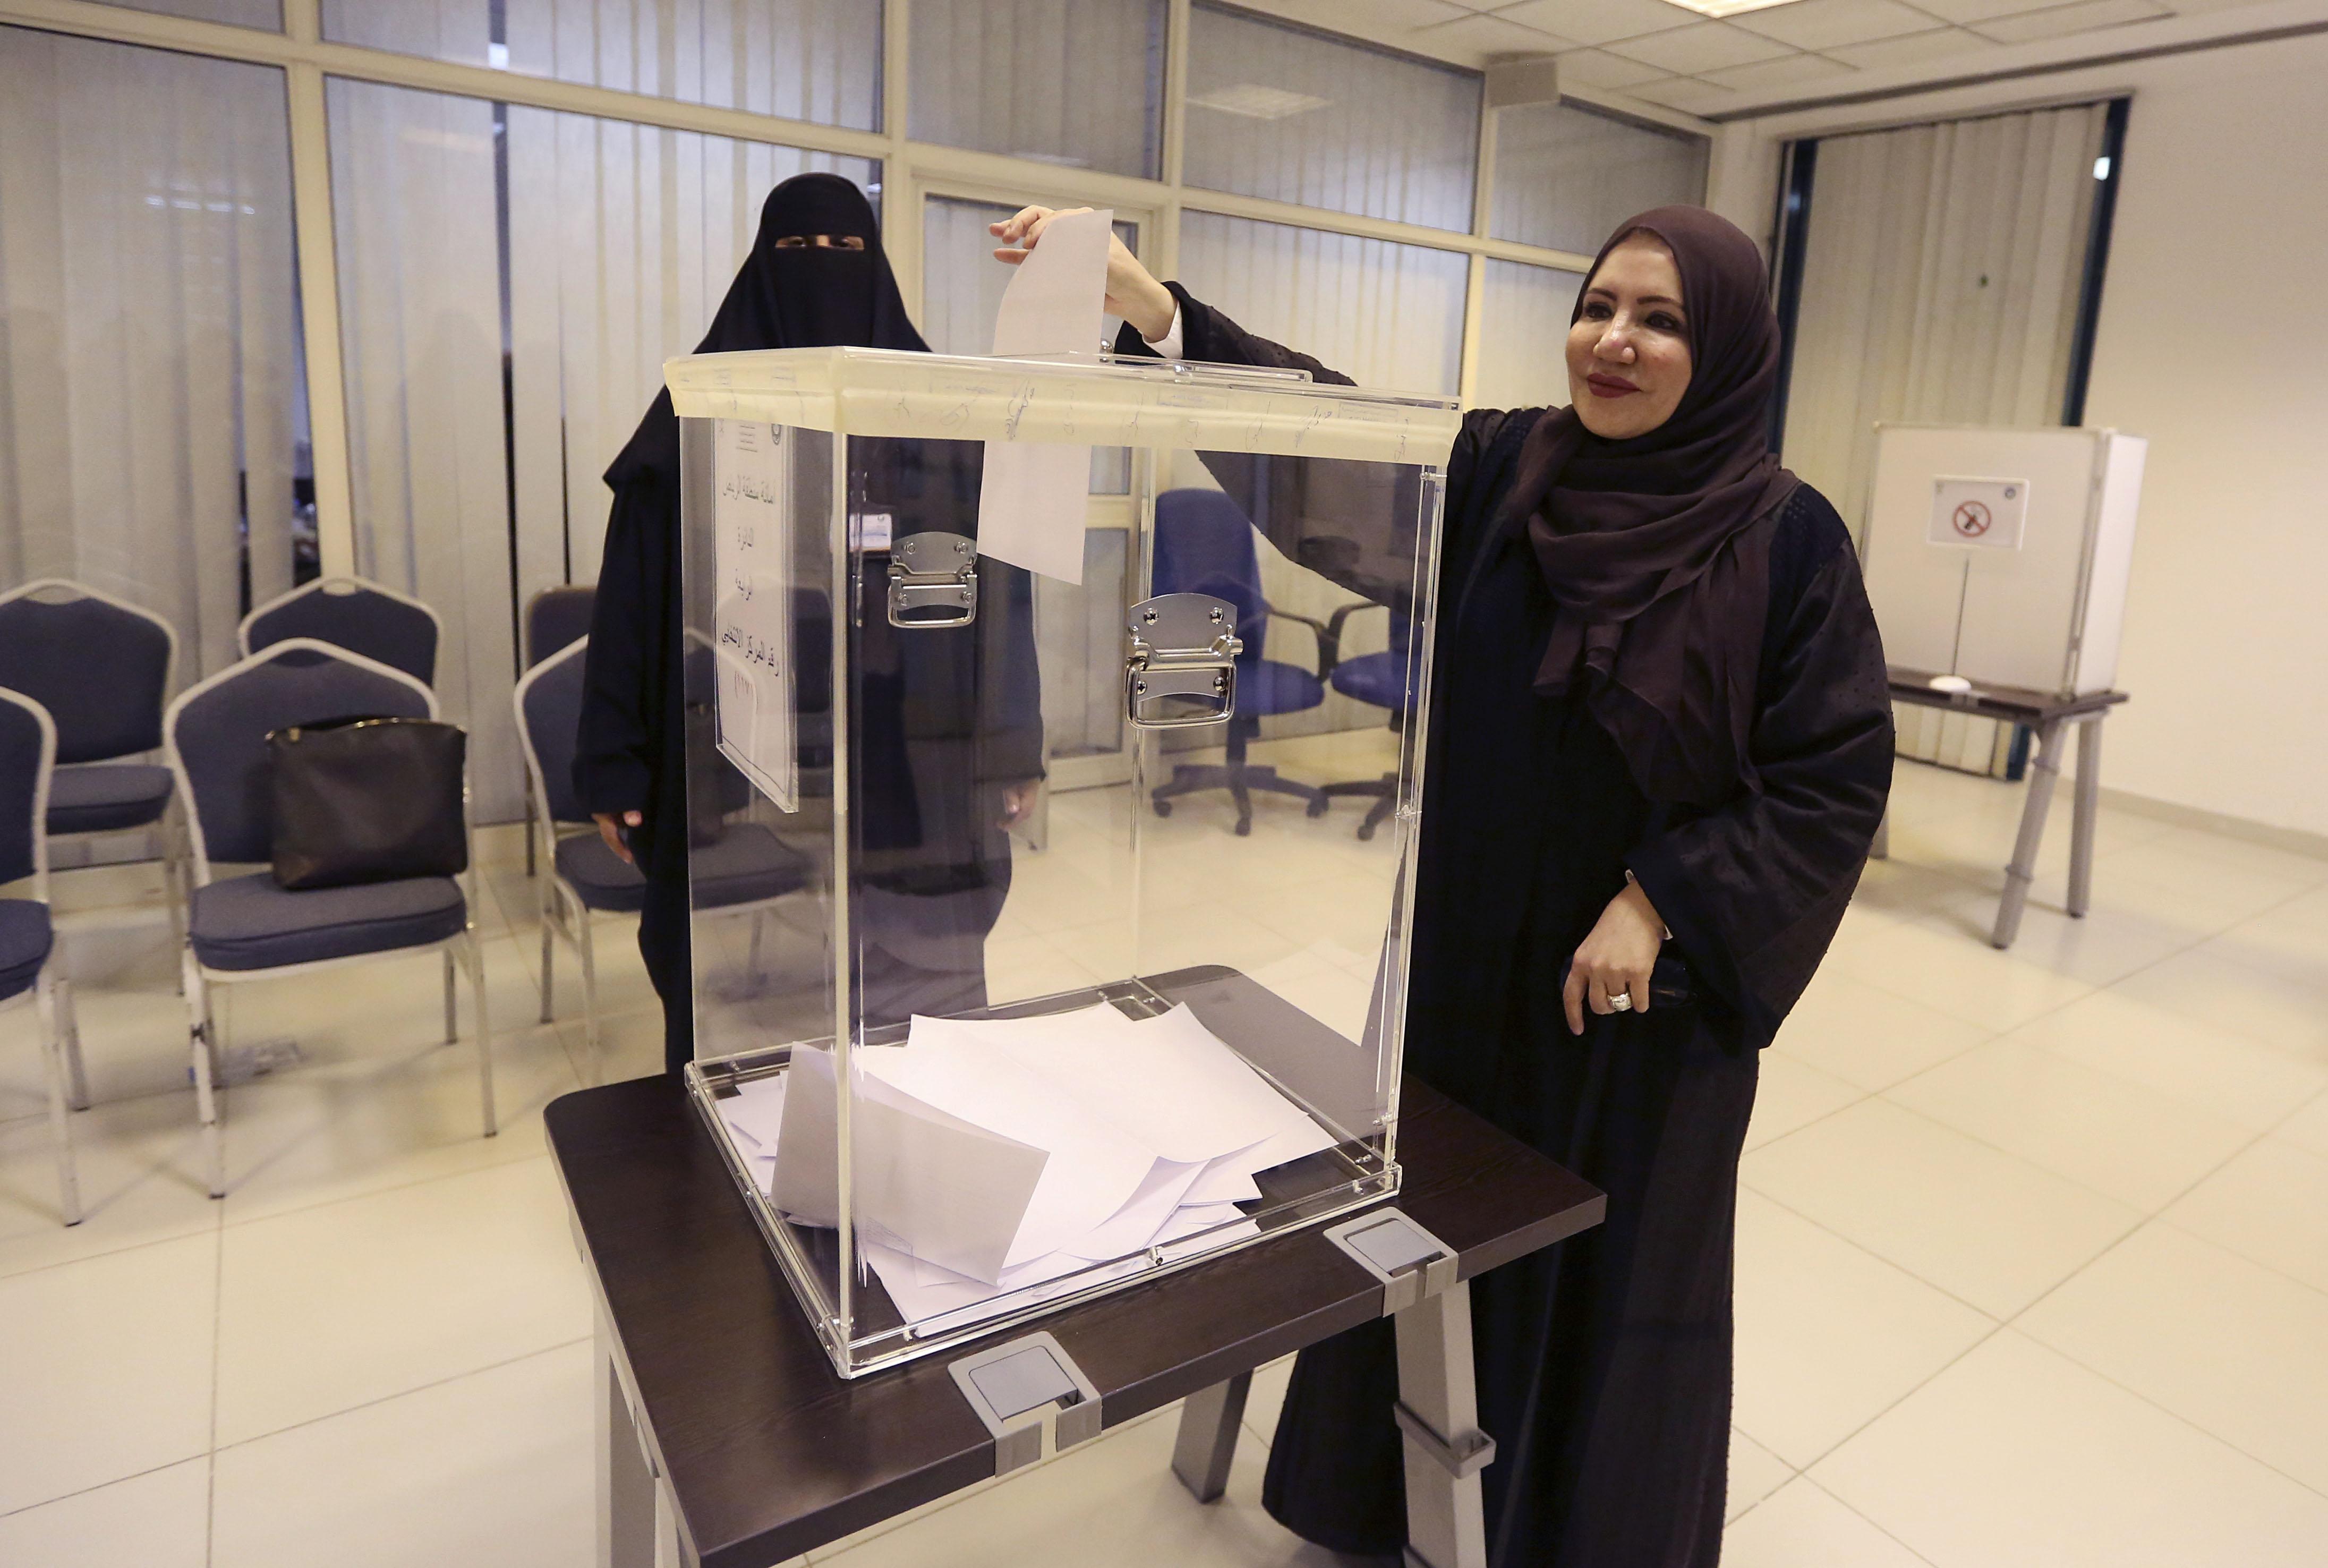 Starbucks in Saudi Arabia Reportedly Denied Women Entry